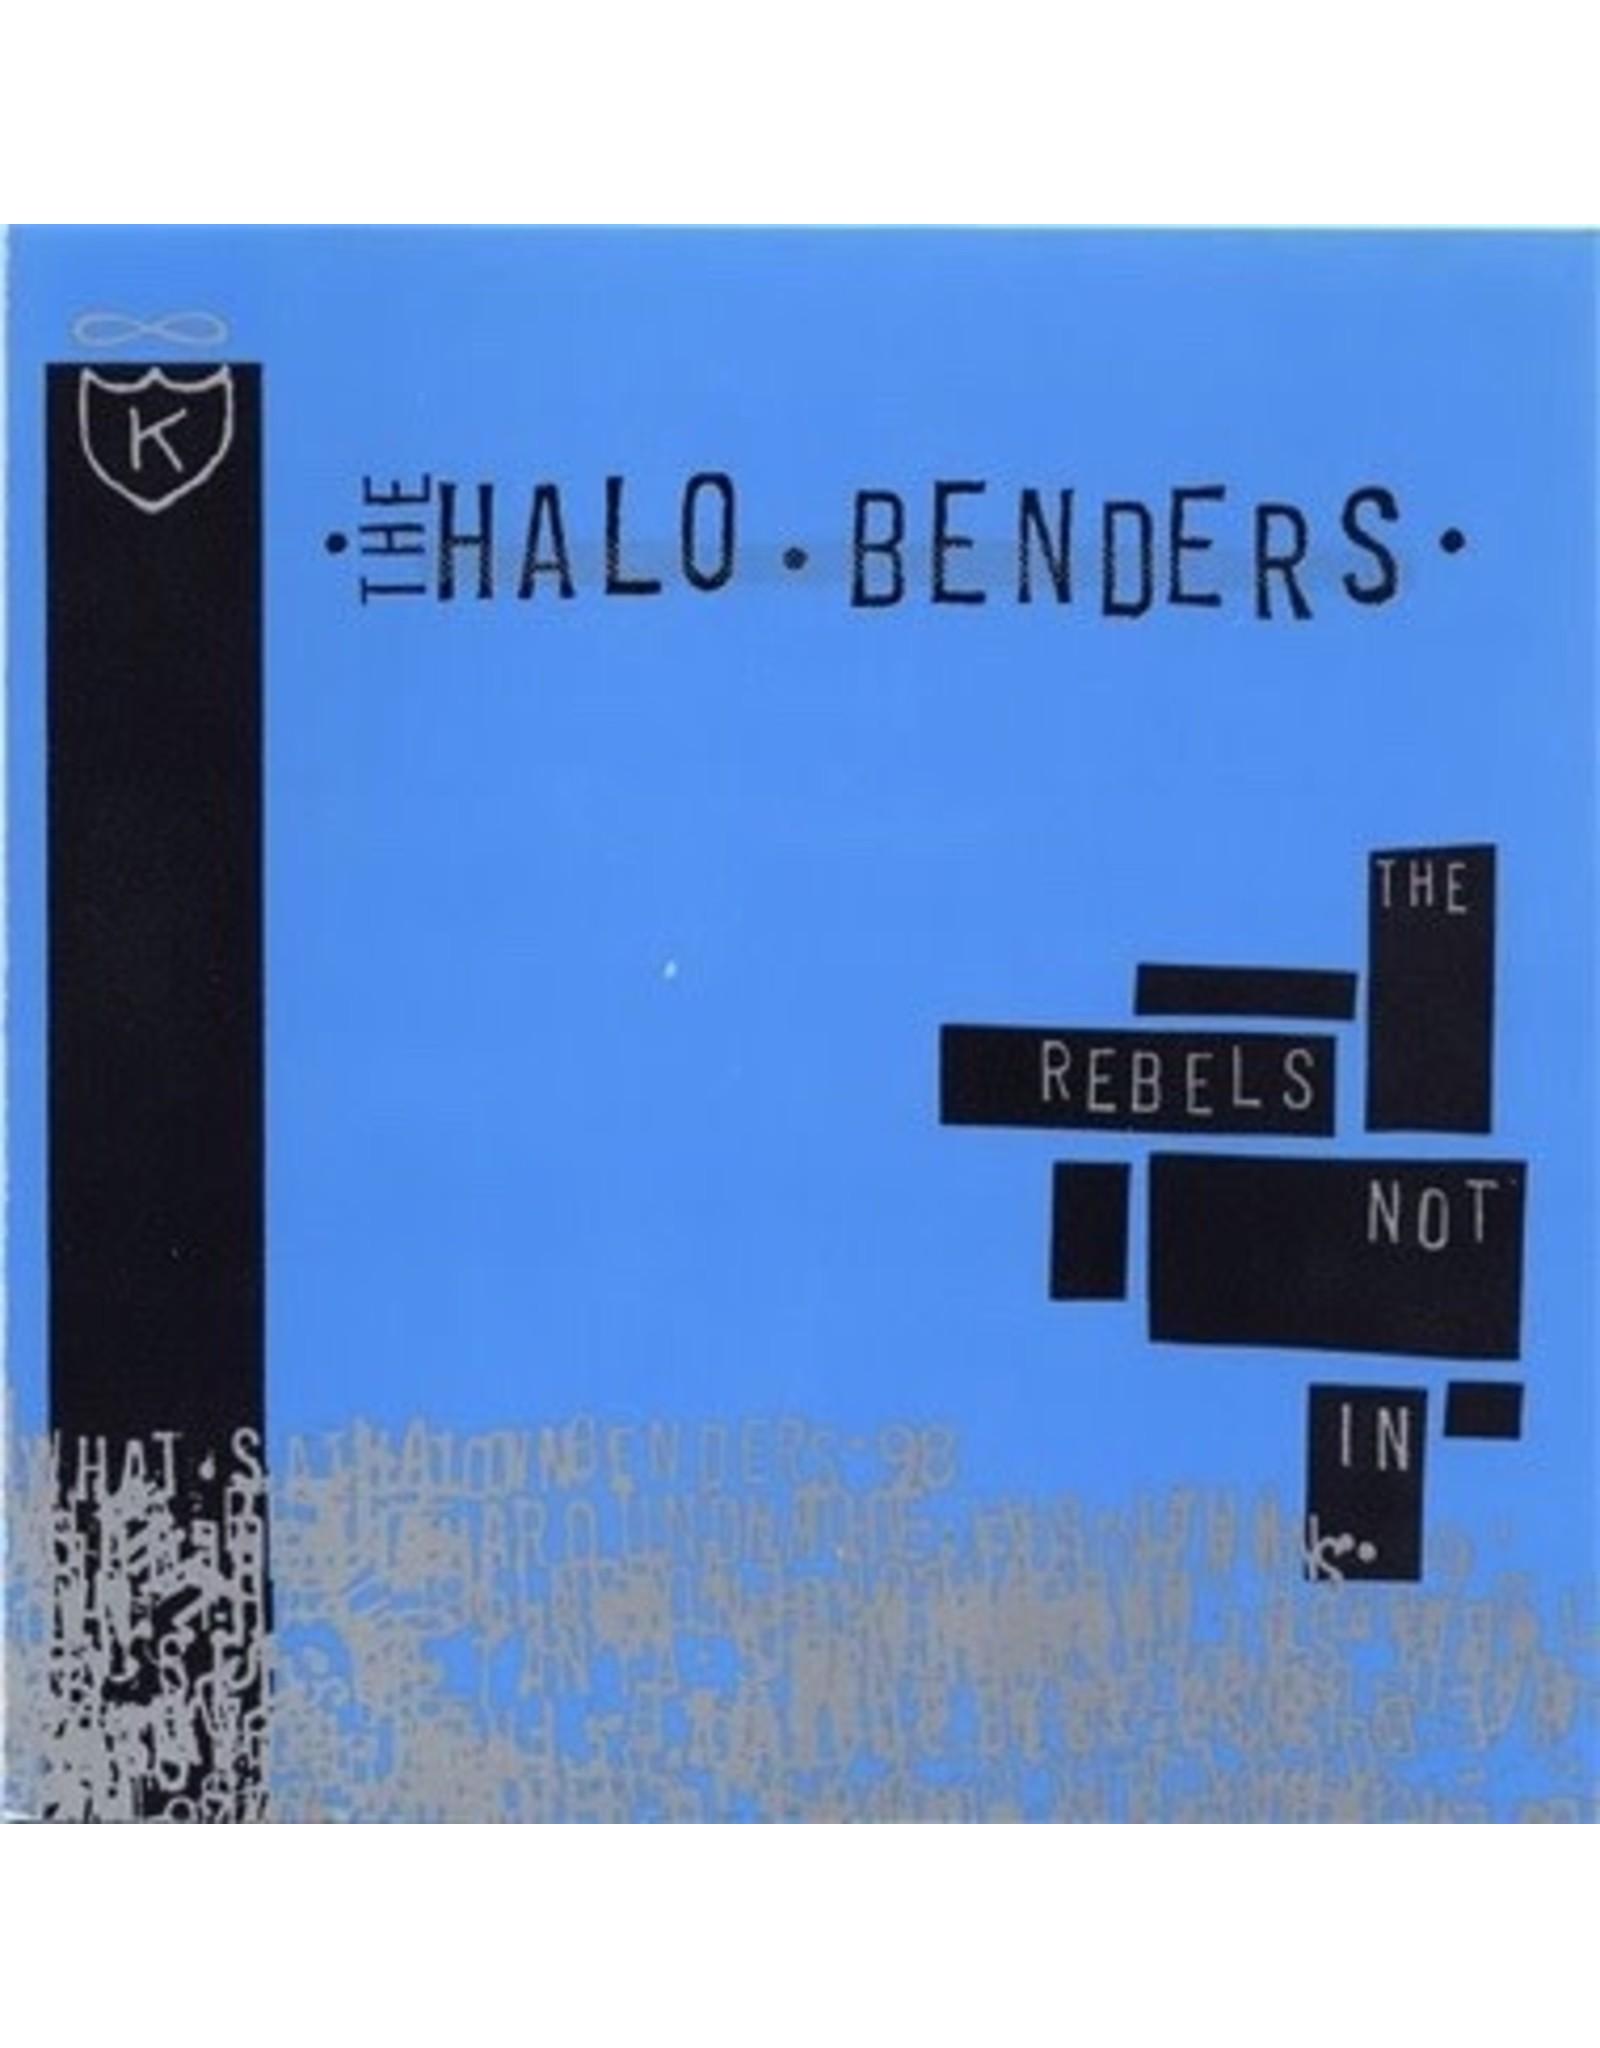 New Vinyl Halo Benders - The Rebels Not In LP